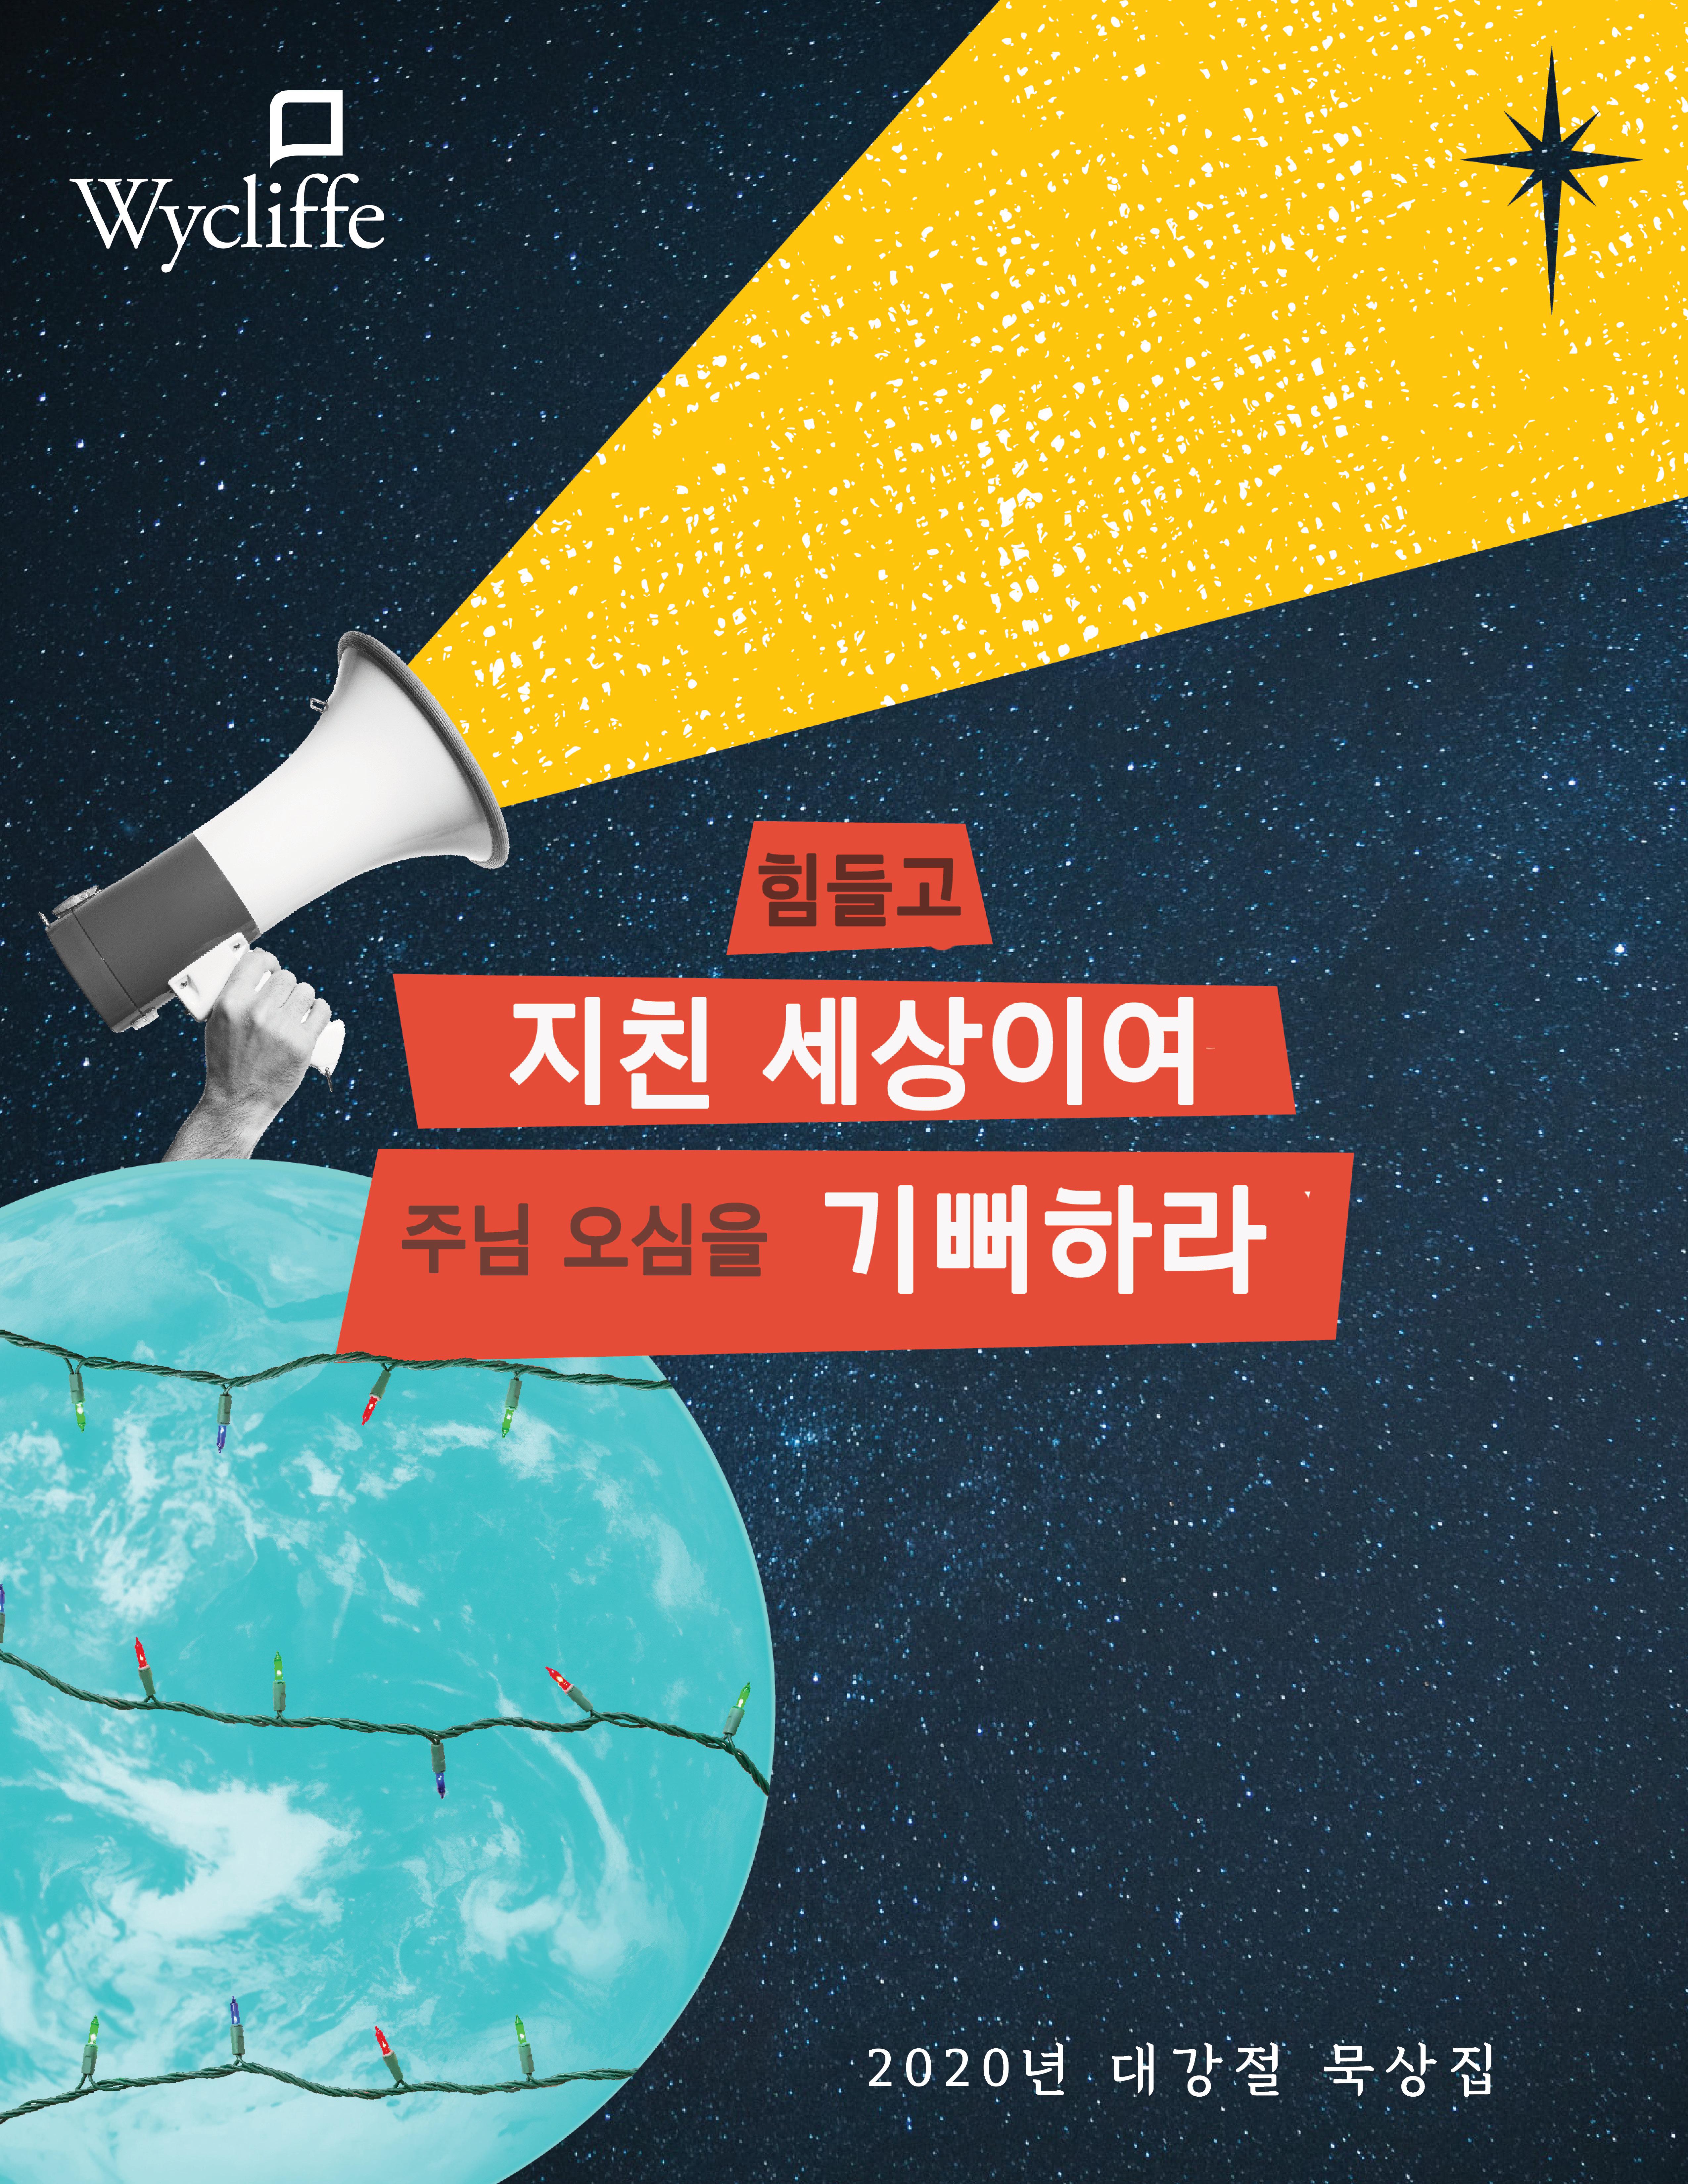 2020_WYC_advent_devotional_Korean.jpg